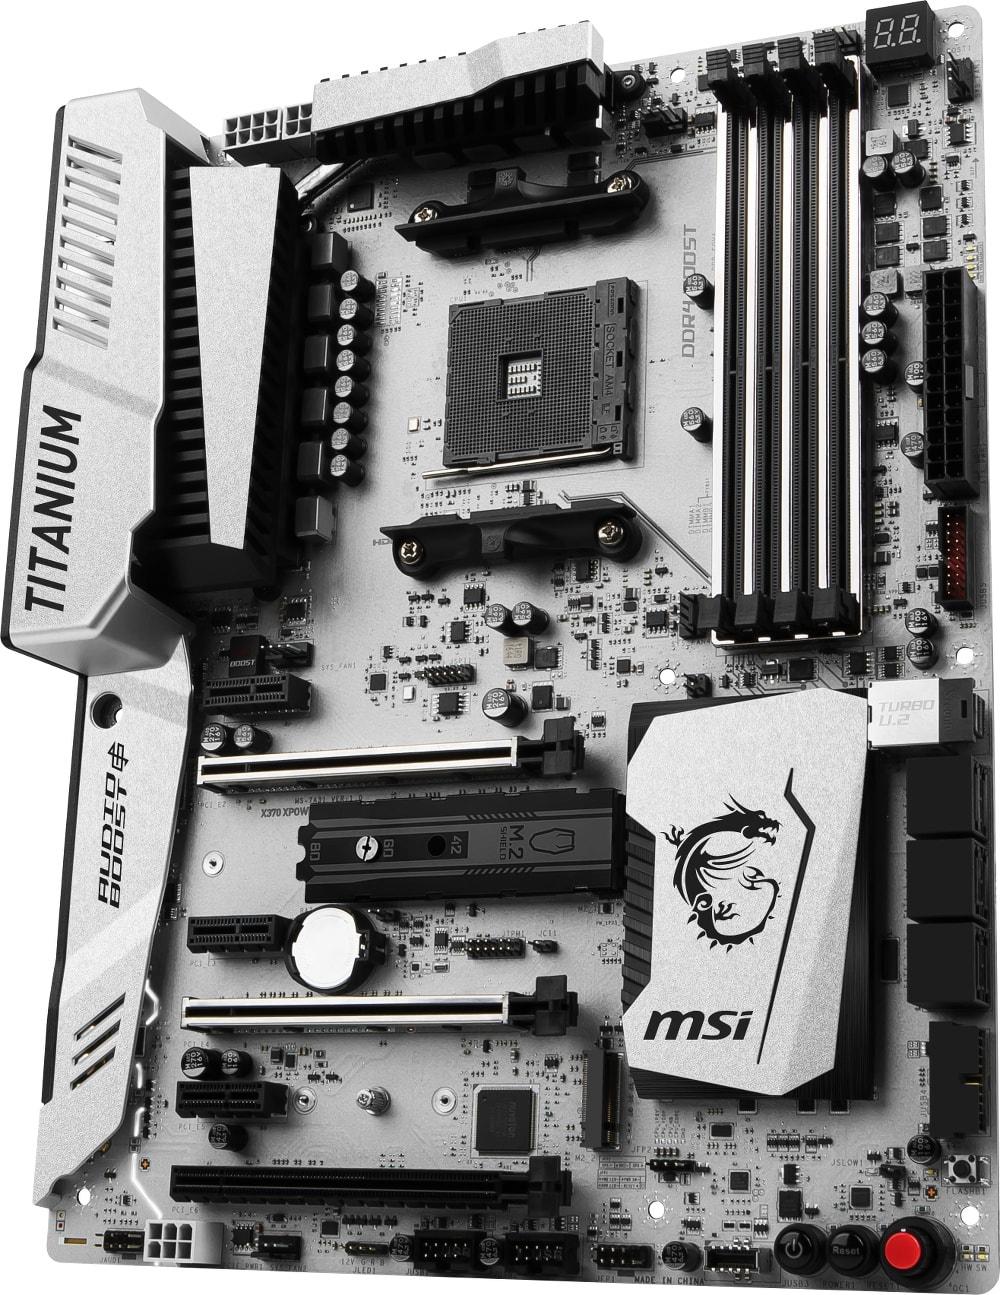 MSI X370 XPOWER GAMING TITANIUM ATX DDR4 - Carte mère MSI - 1